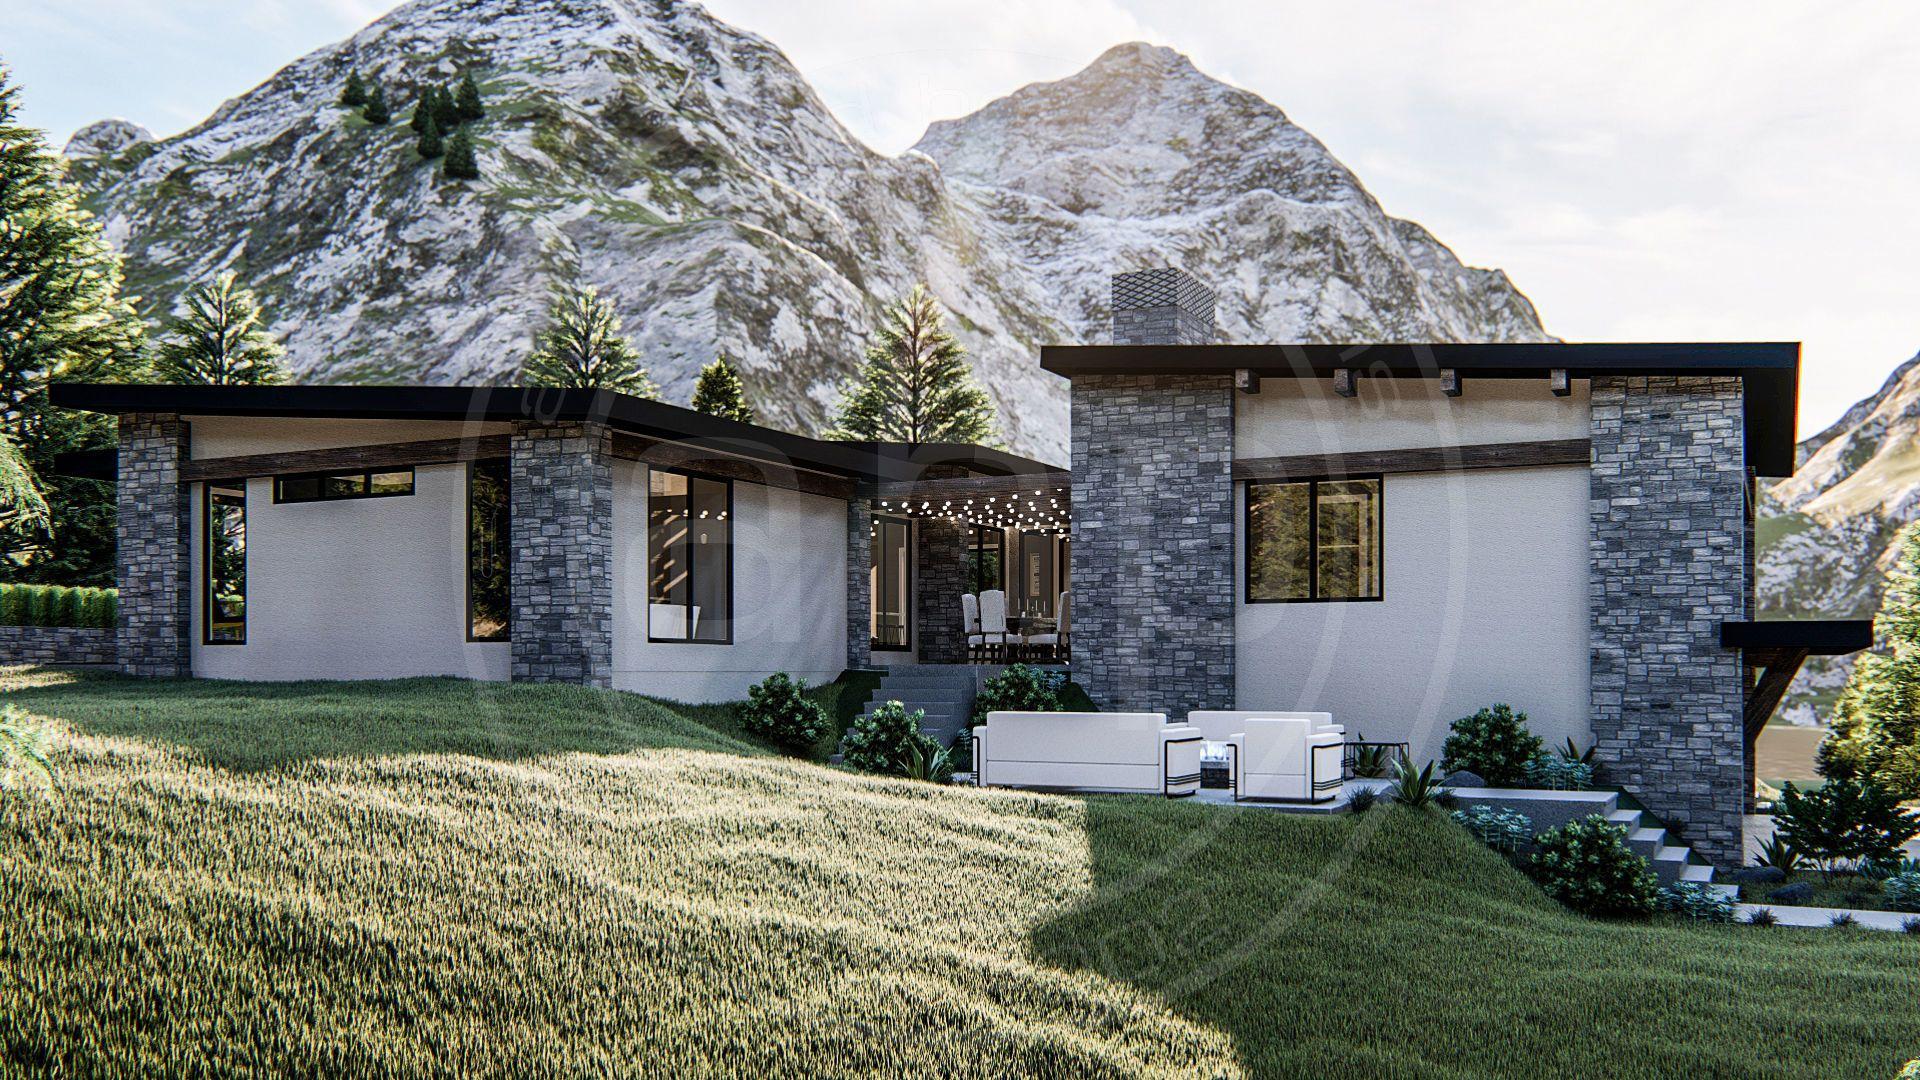 Long Beach 1 Story Modern House Plan in 2020 | Courtyard house ...